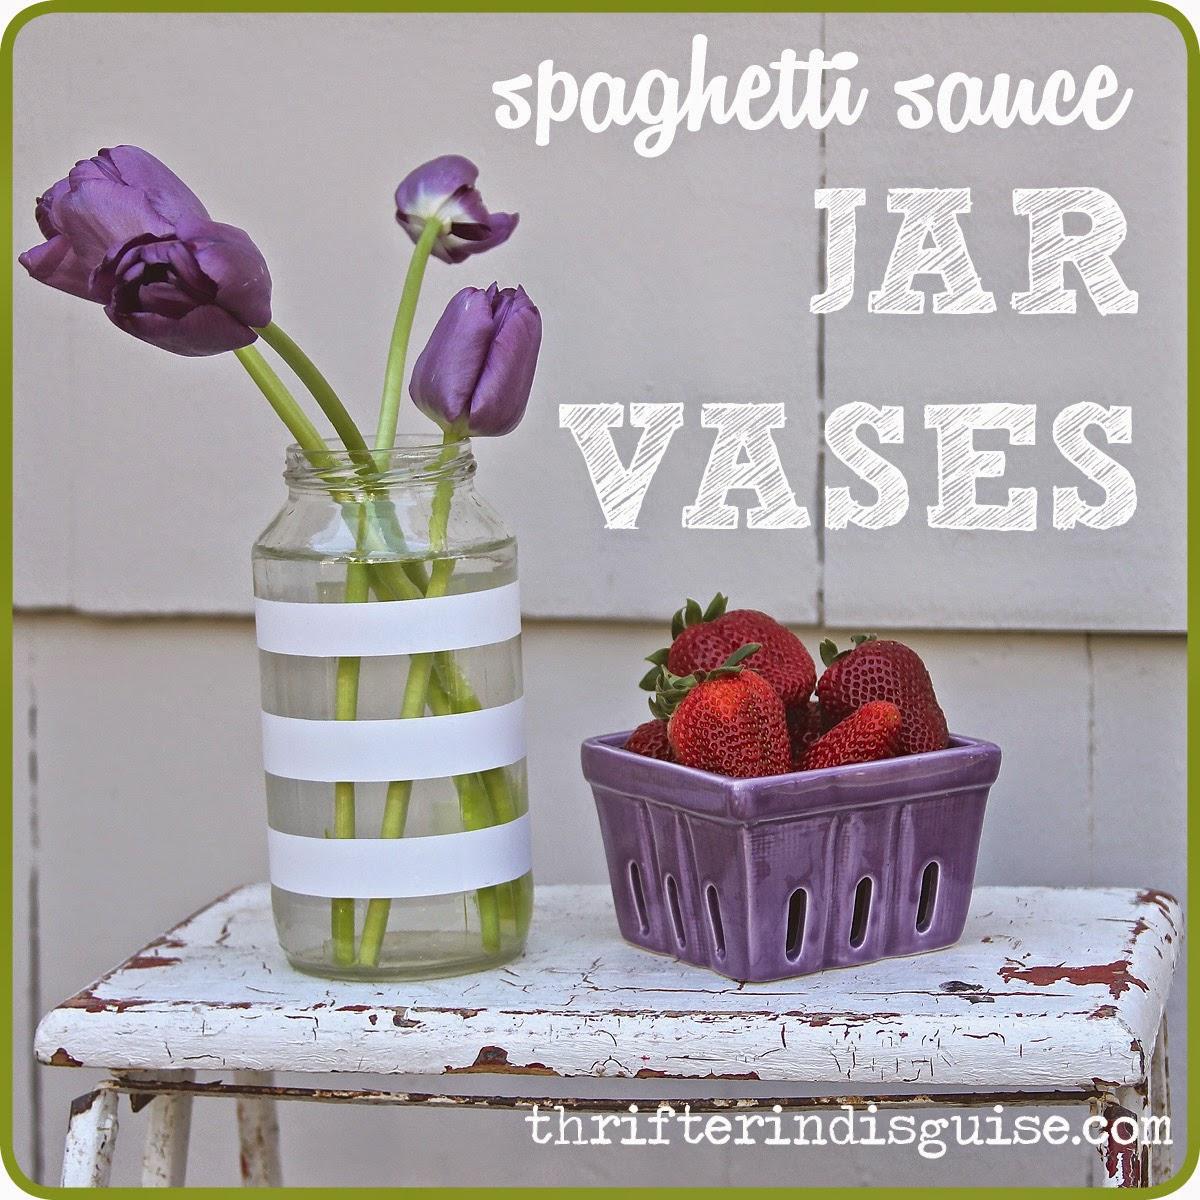 Upcycled Spaghetti Sauce Jars